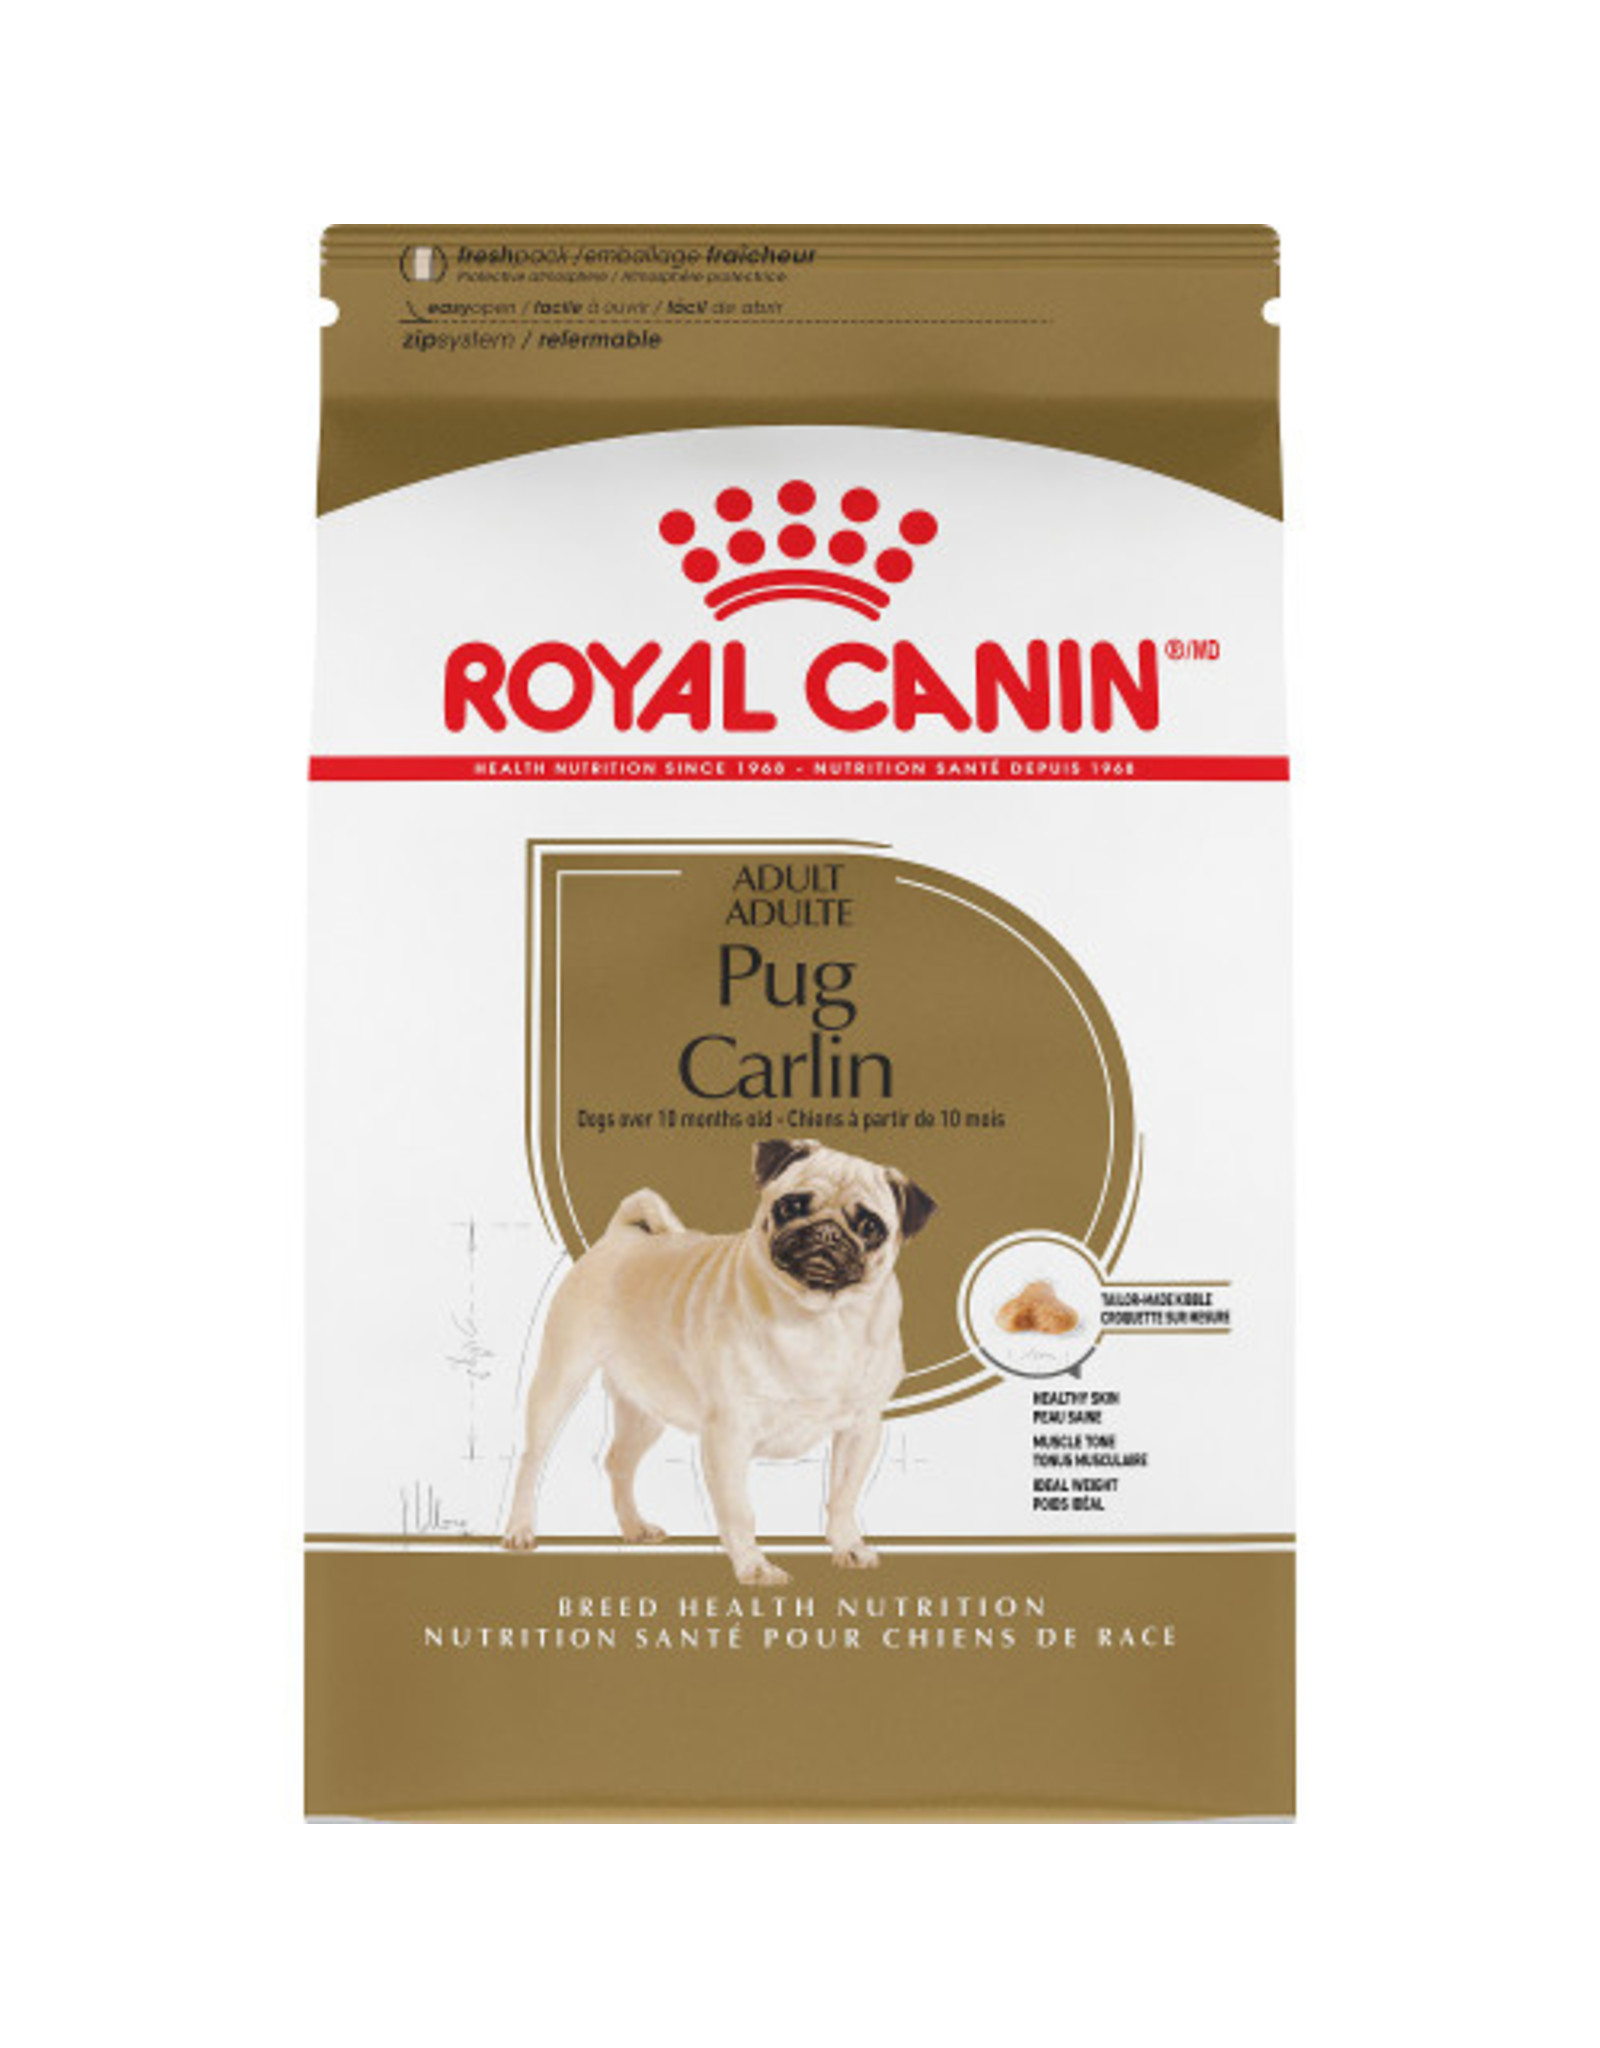 Royal Canin Royal Canin Pug Adult 10lb